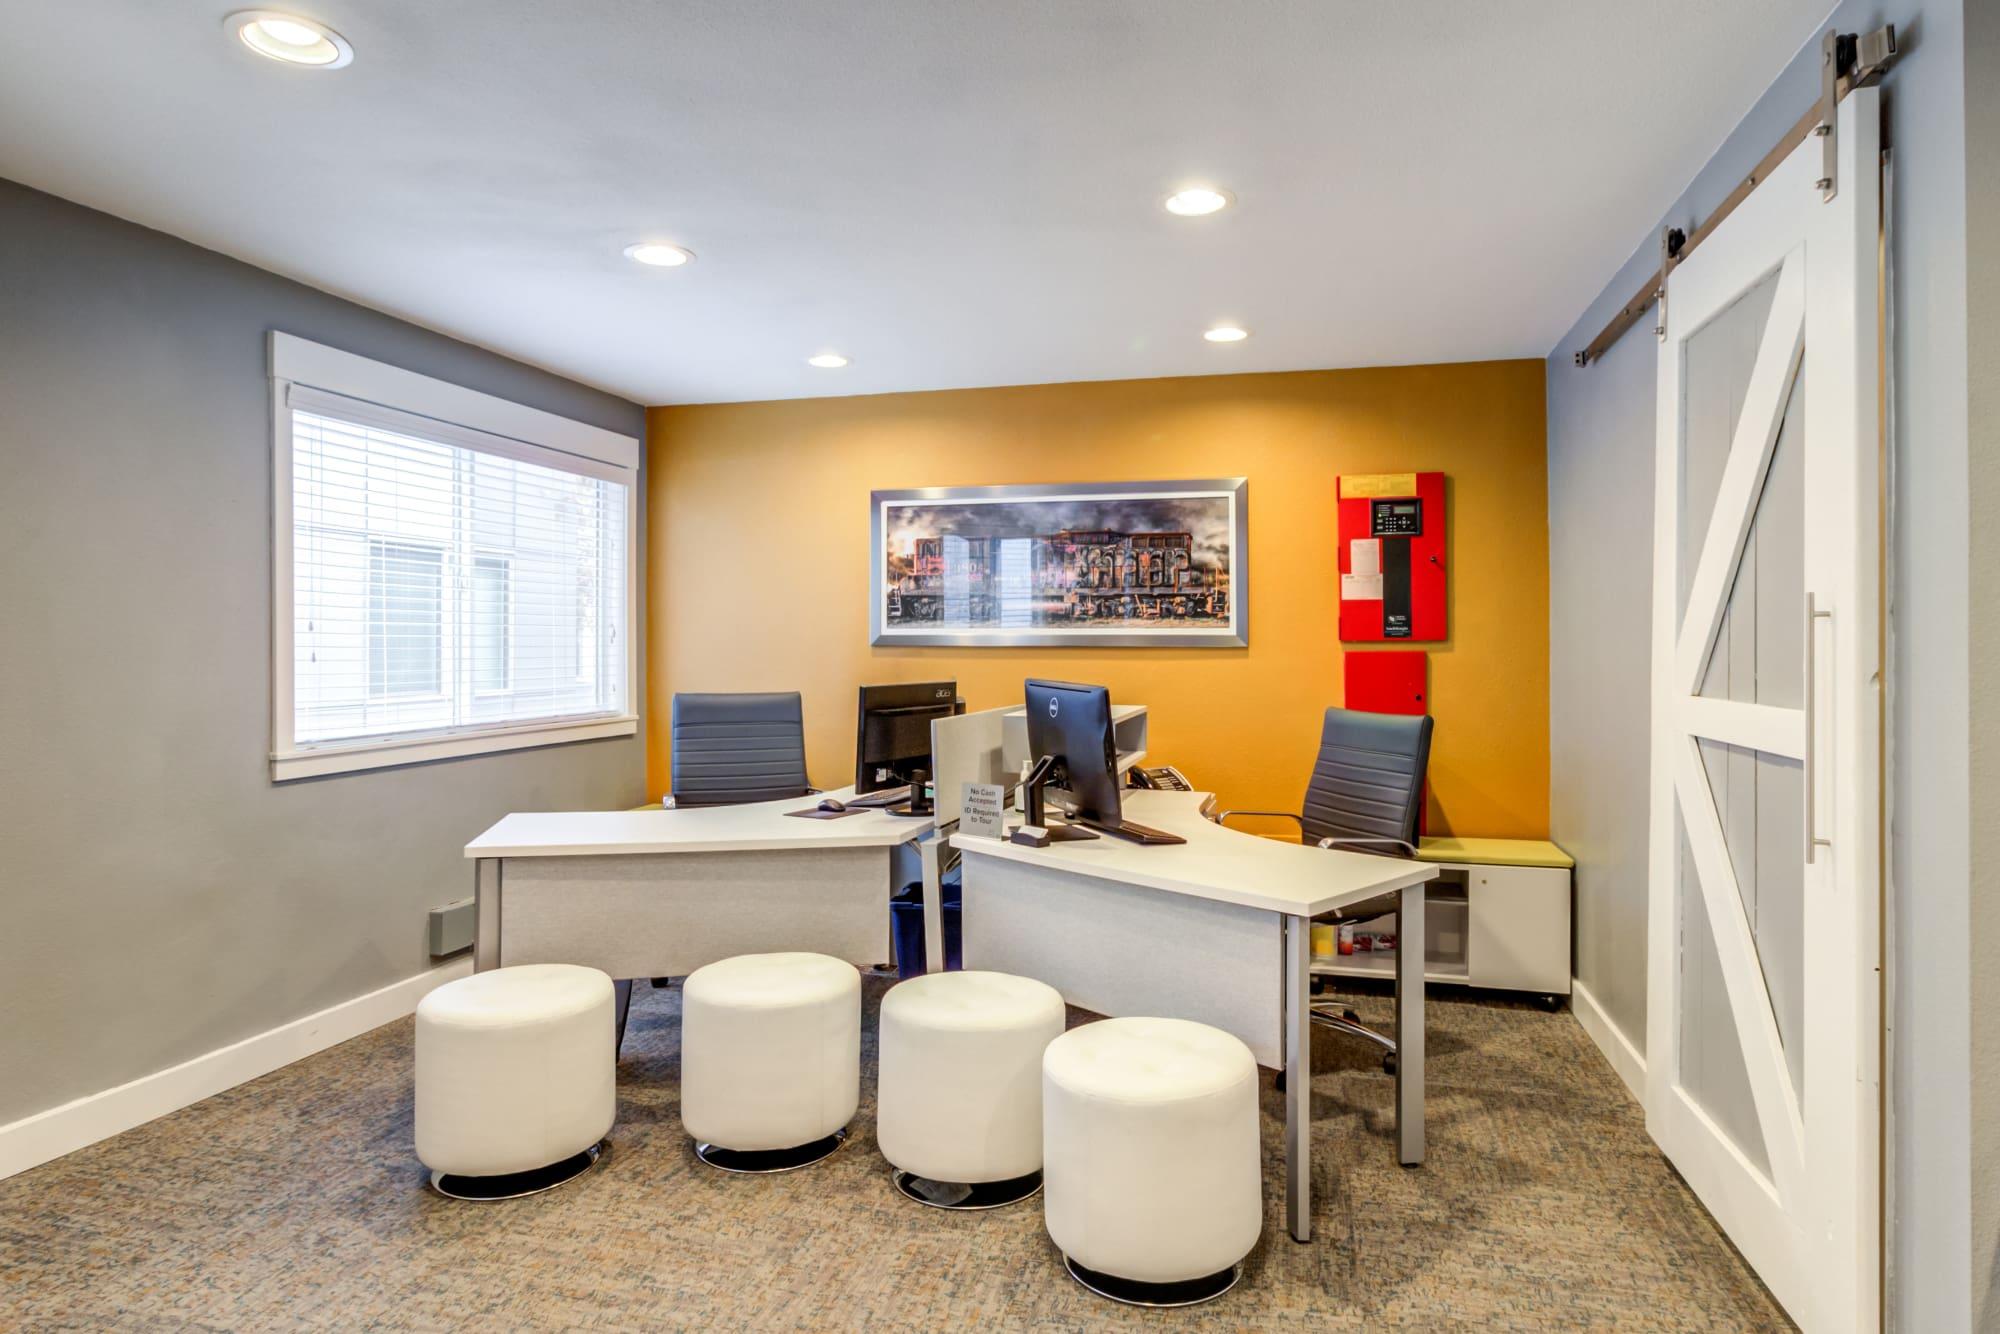 Leasing Office at Elan 41 Apartments in Seattle, WA